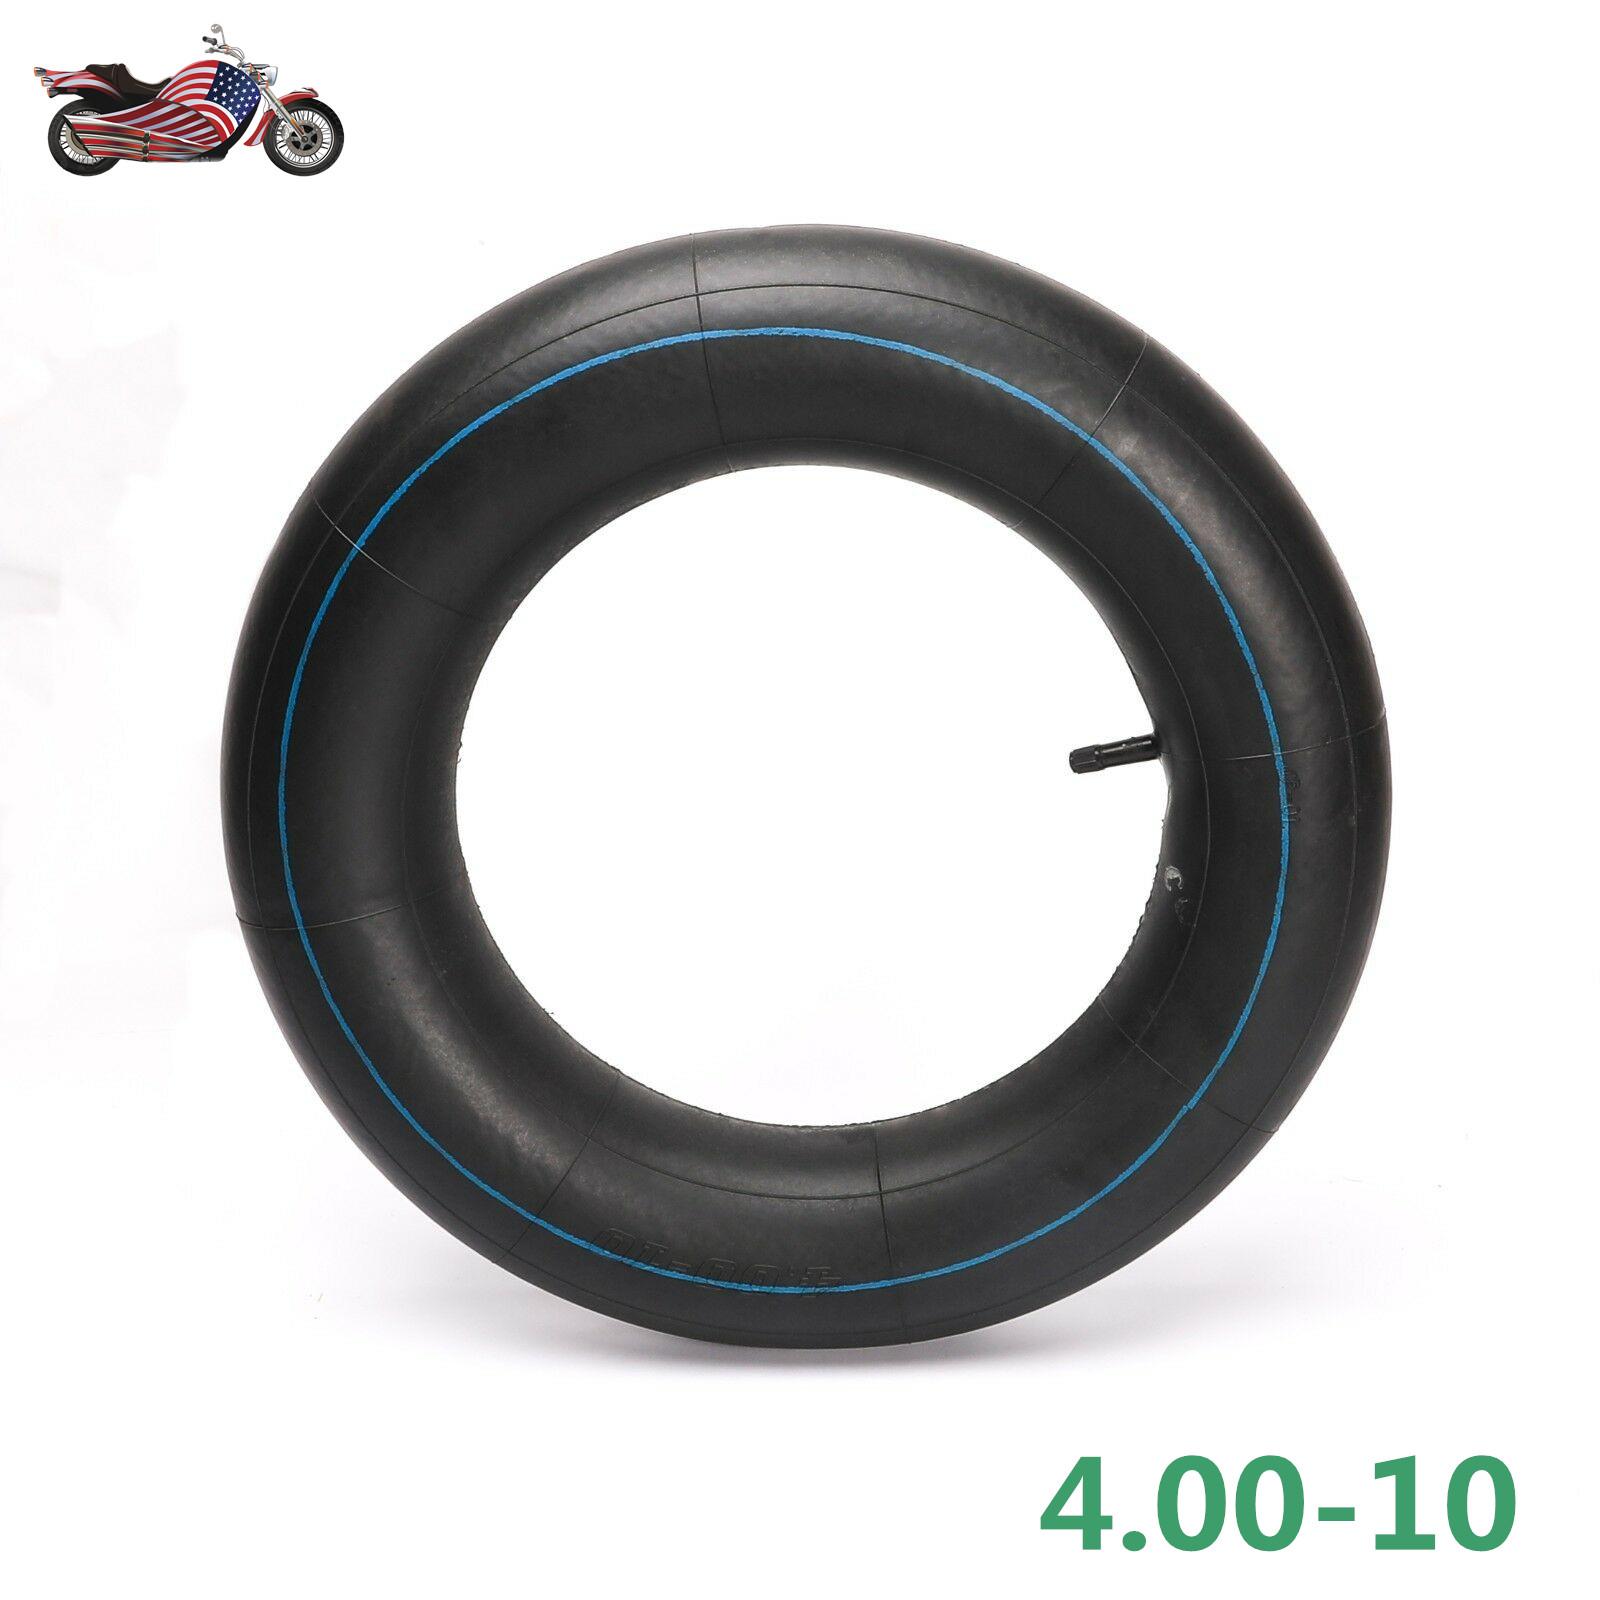 4.00-10 Tire Inner Motorcycle Tube HONDA CT70 CT70H 70 Mini Trail 3.50-10